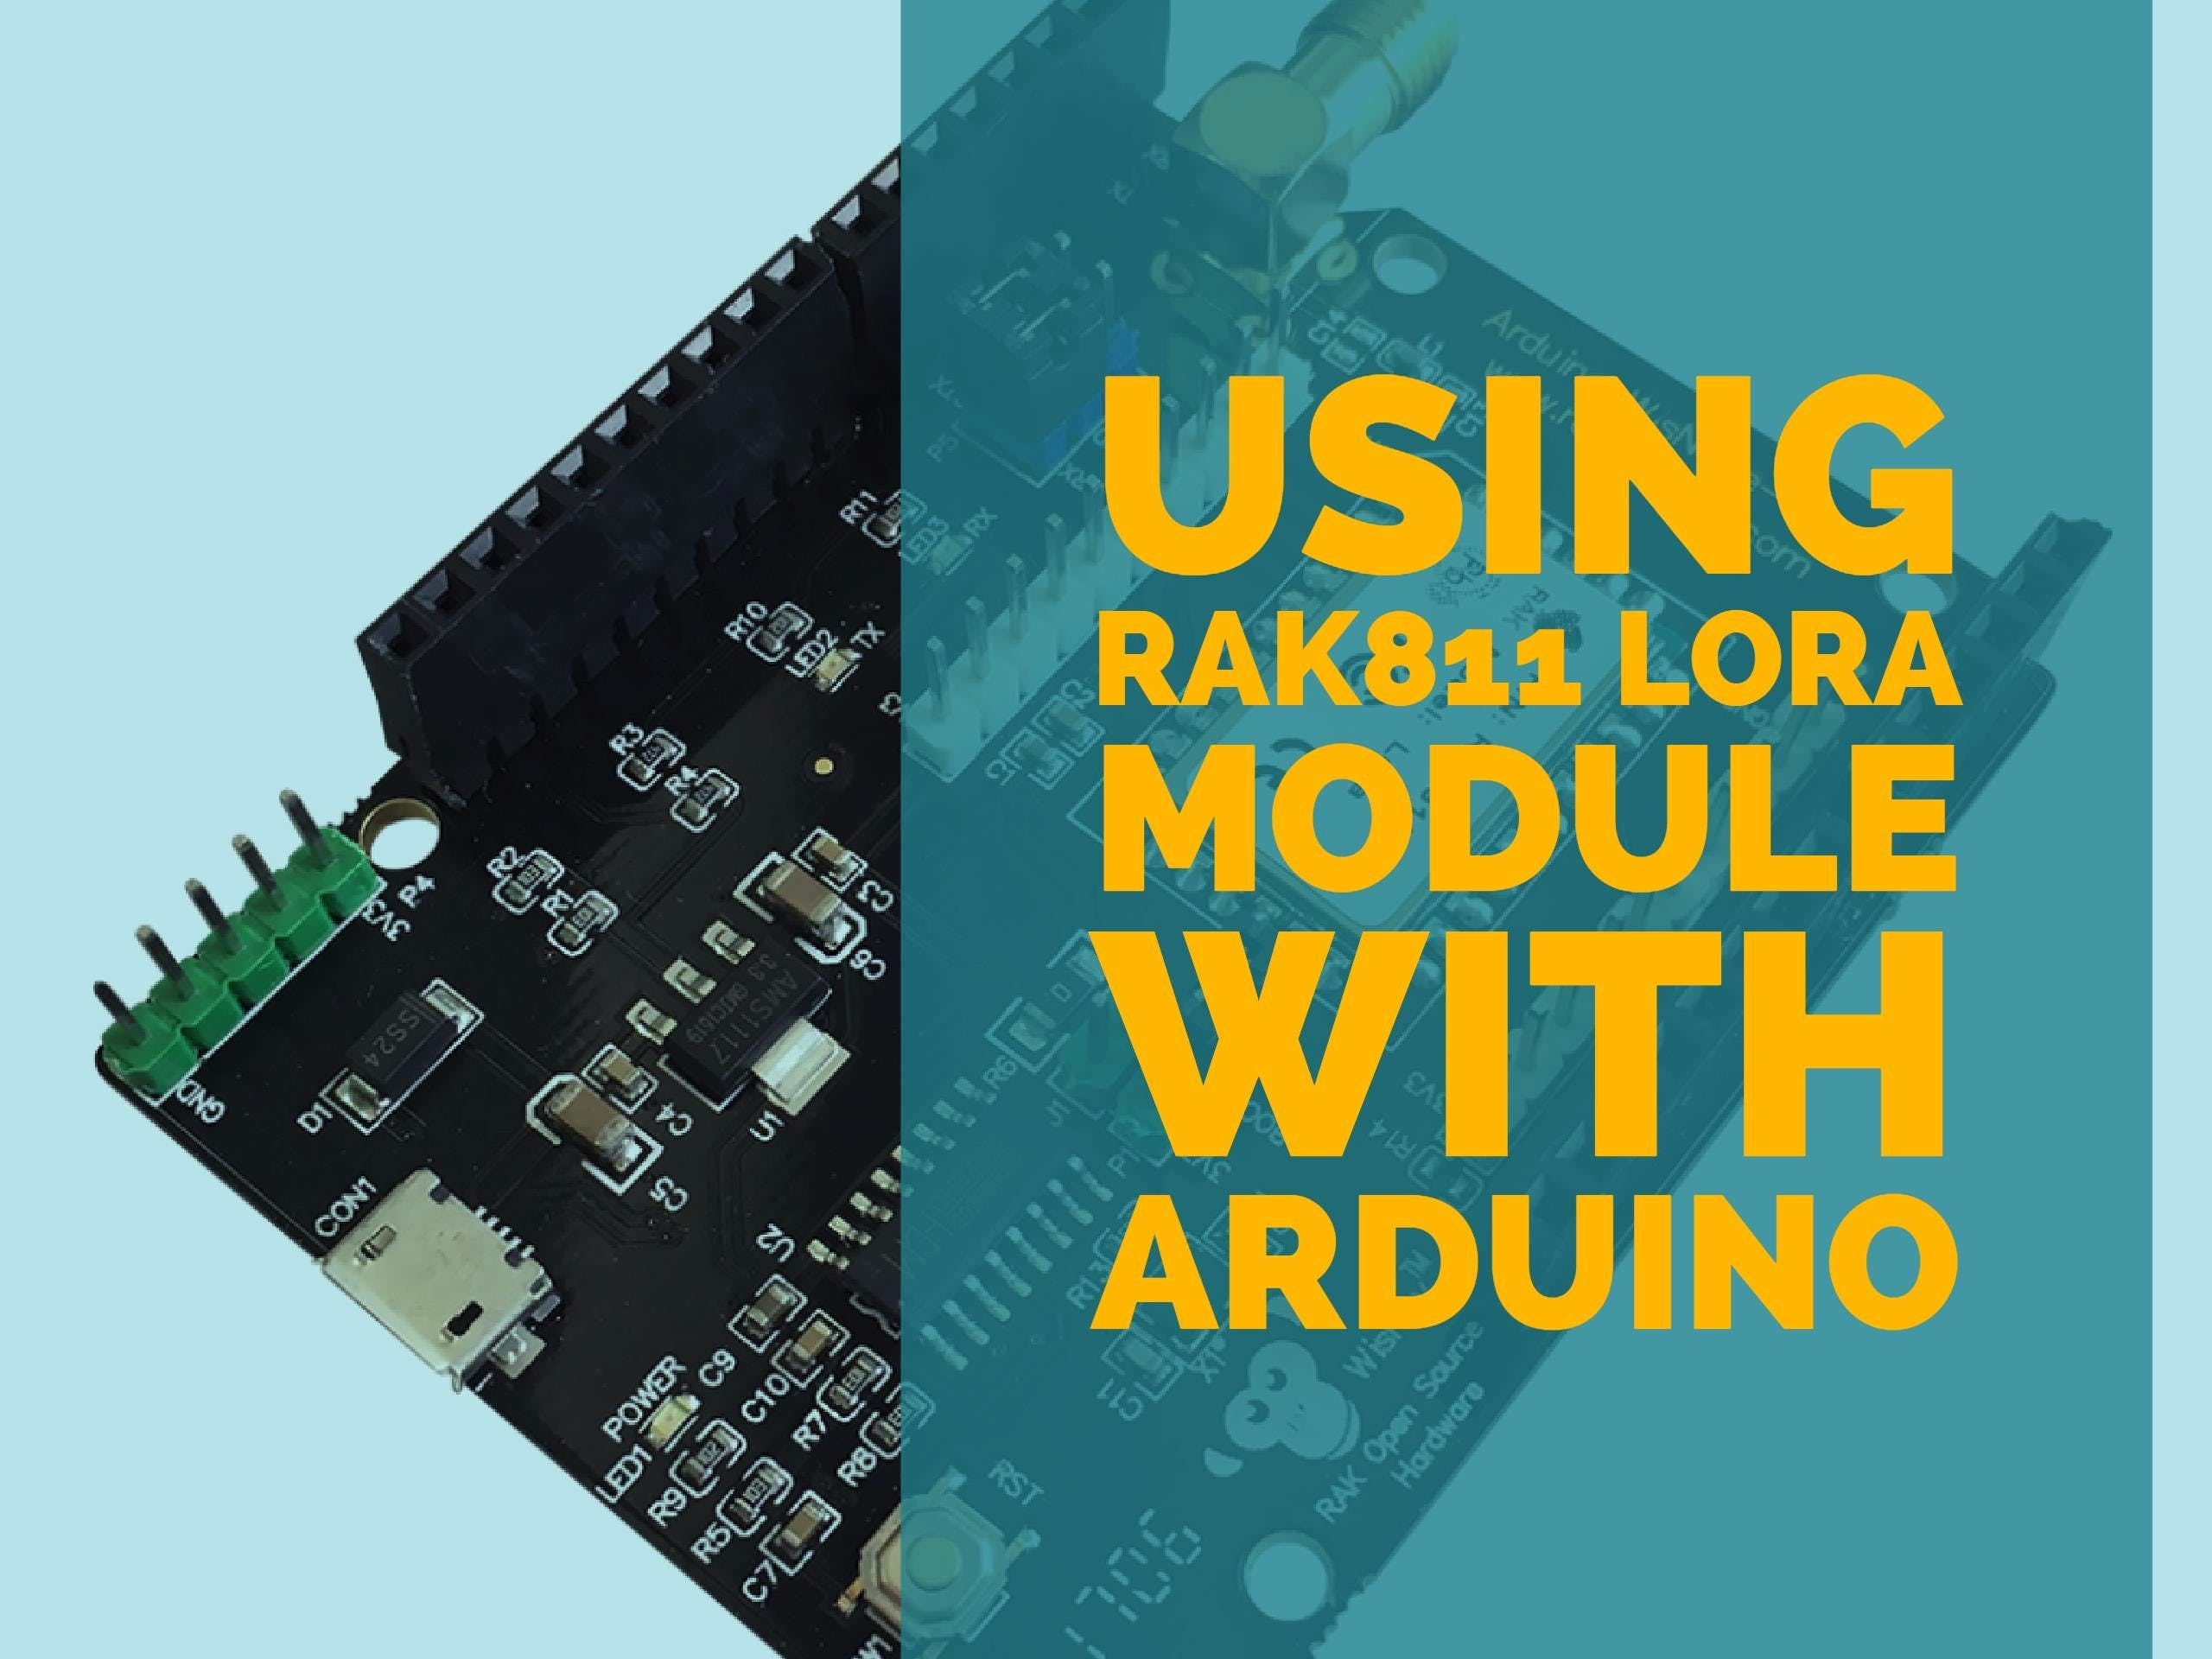 Using the RAK811 LoRa module with Arduino